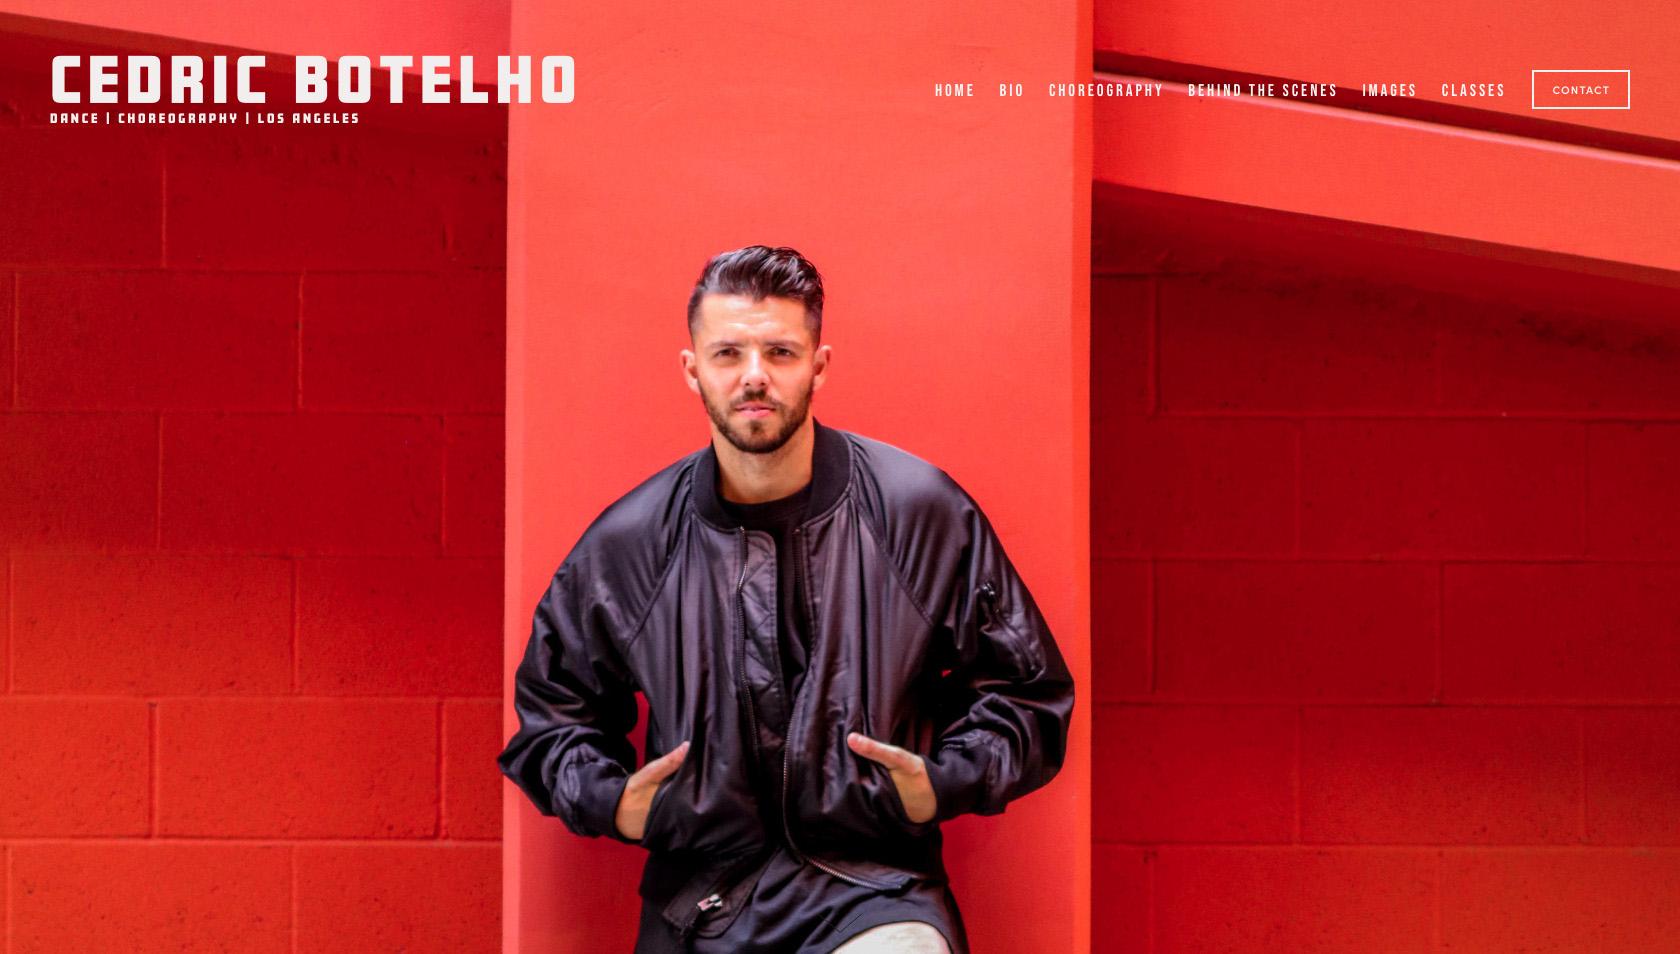 Screenshot_2019-06-05 Cedric Botelho - Los Angeles Choreographer Dancer — Cedric Botelho.jpg